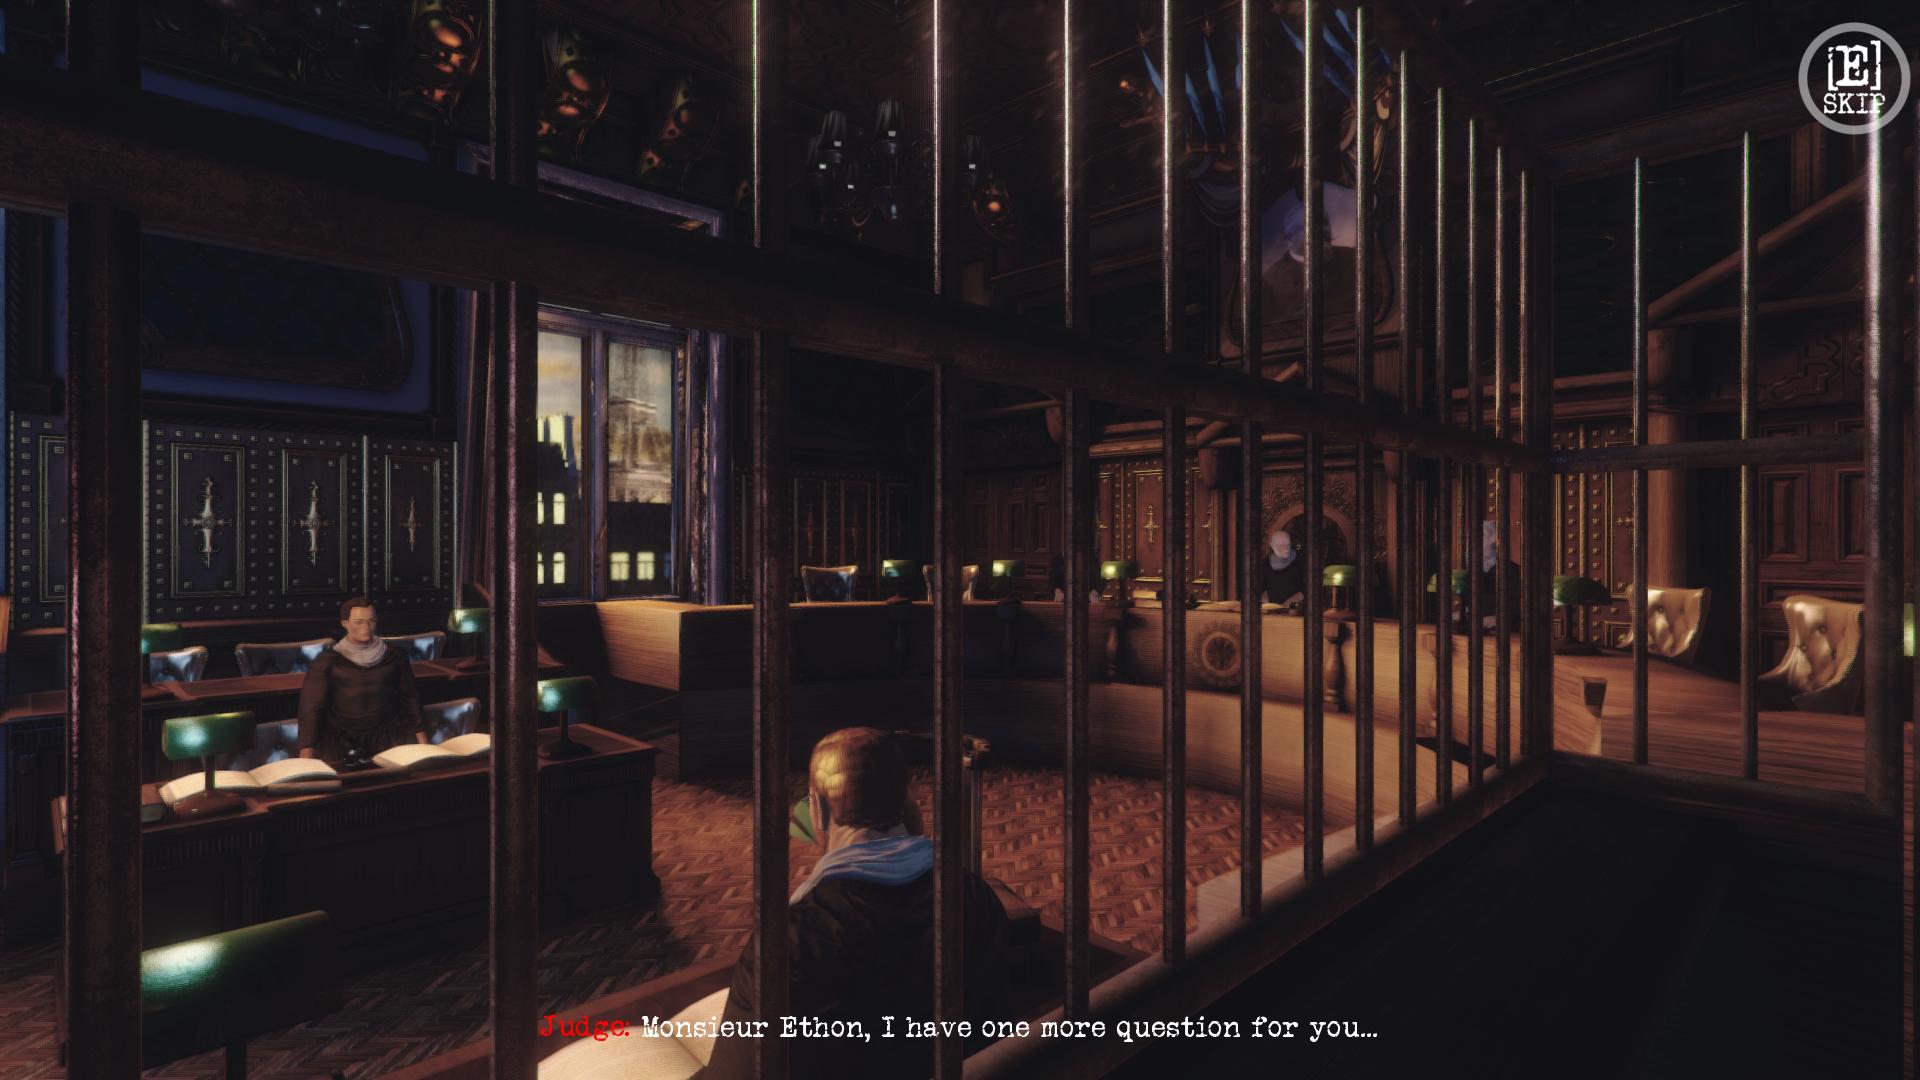 ScreenshotFinal5-2.png